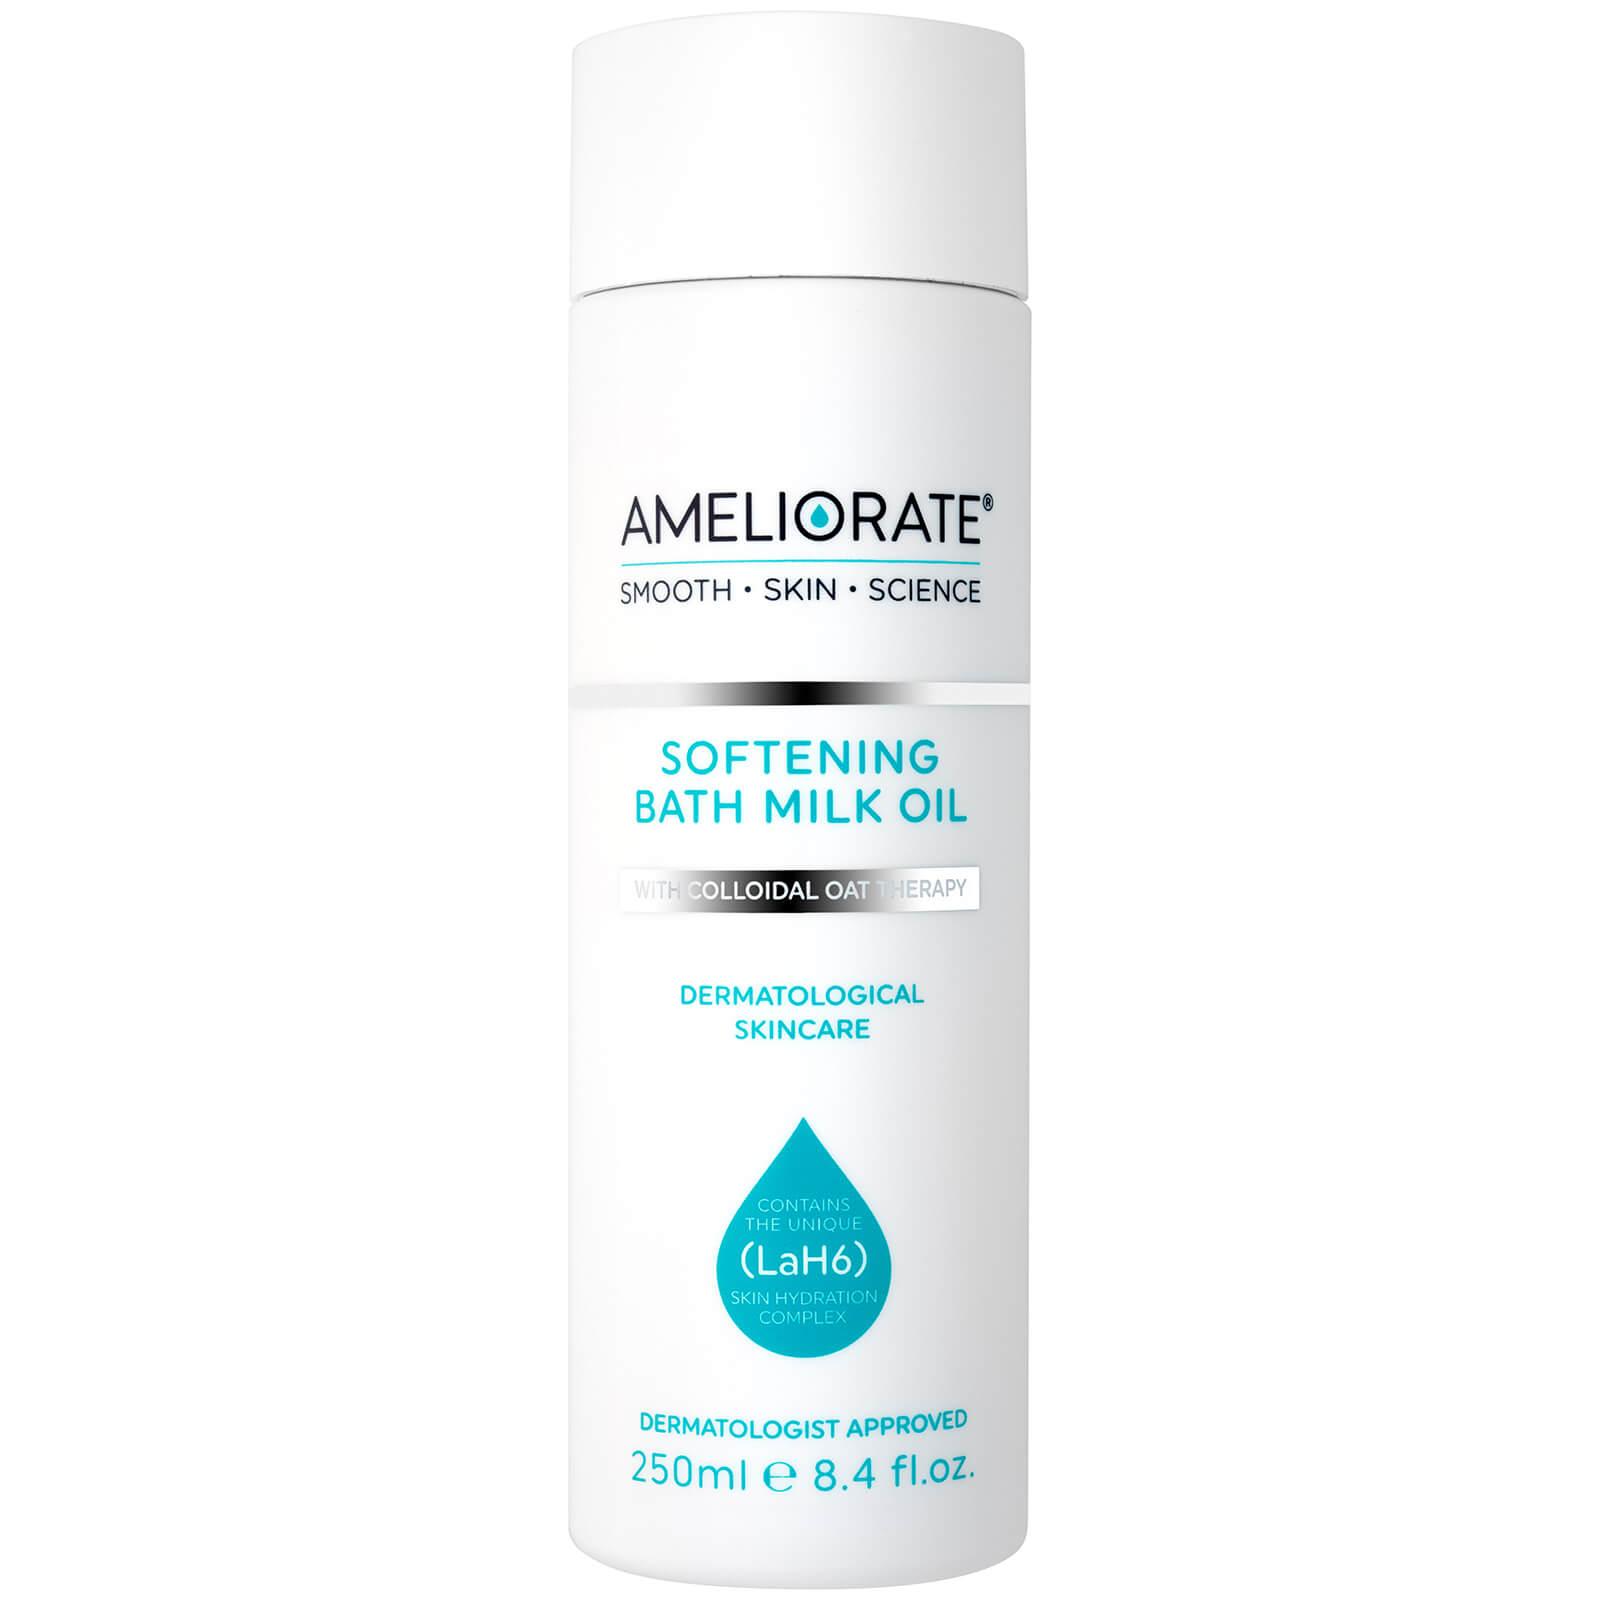 AMELIORATE Softening Bath Milk Oil 250ml